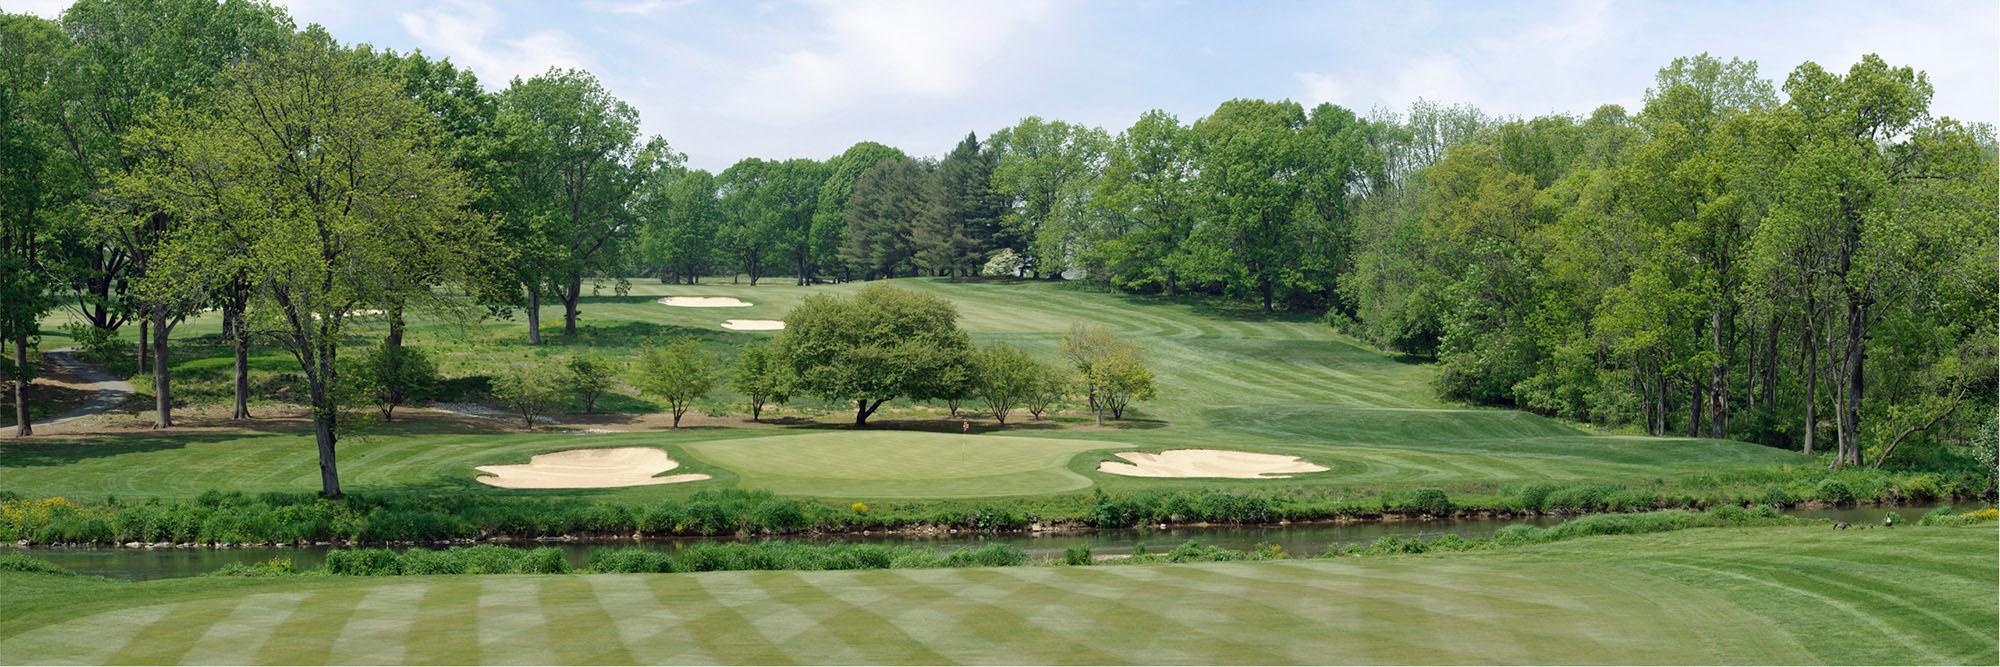 Golf Course Image - Lehigh Country Club No. 7